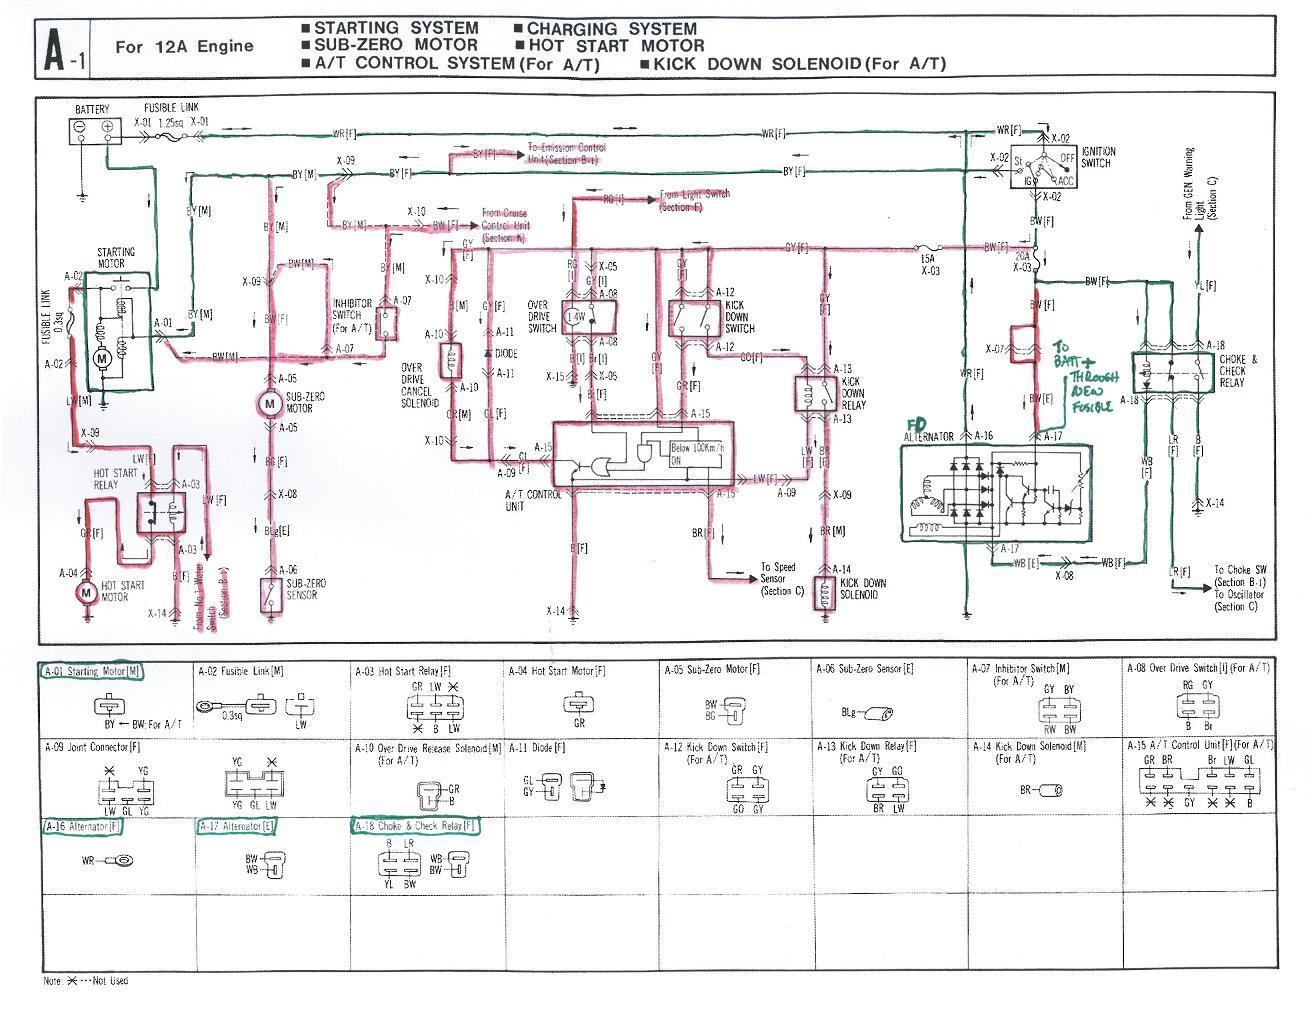 Fl70 Fuse Box Diagram 97 Auto Electrical Wiring Fs Schematic 400 130520062 Old Fashioned Peterbilt 389 Sketch